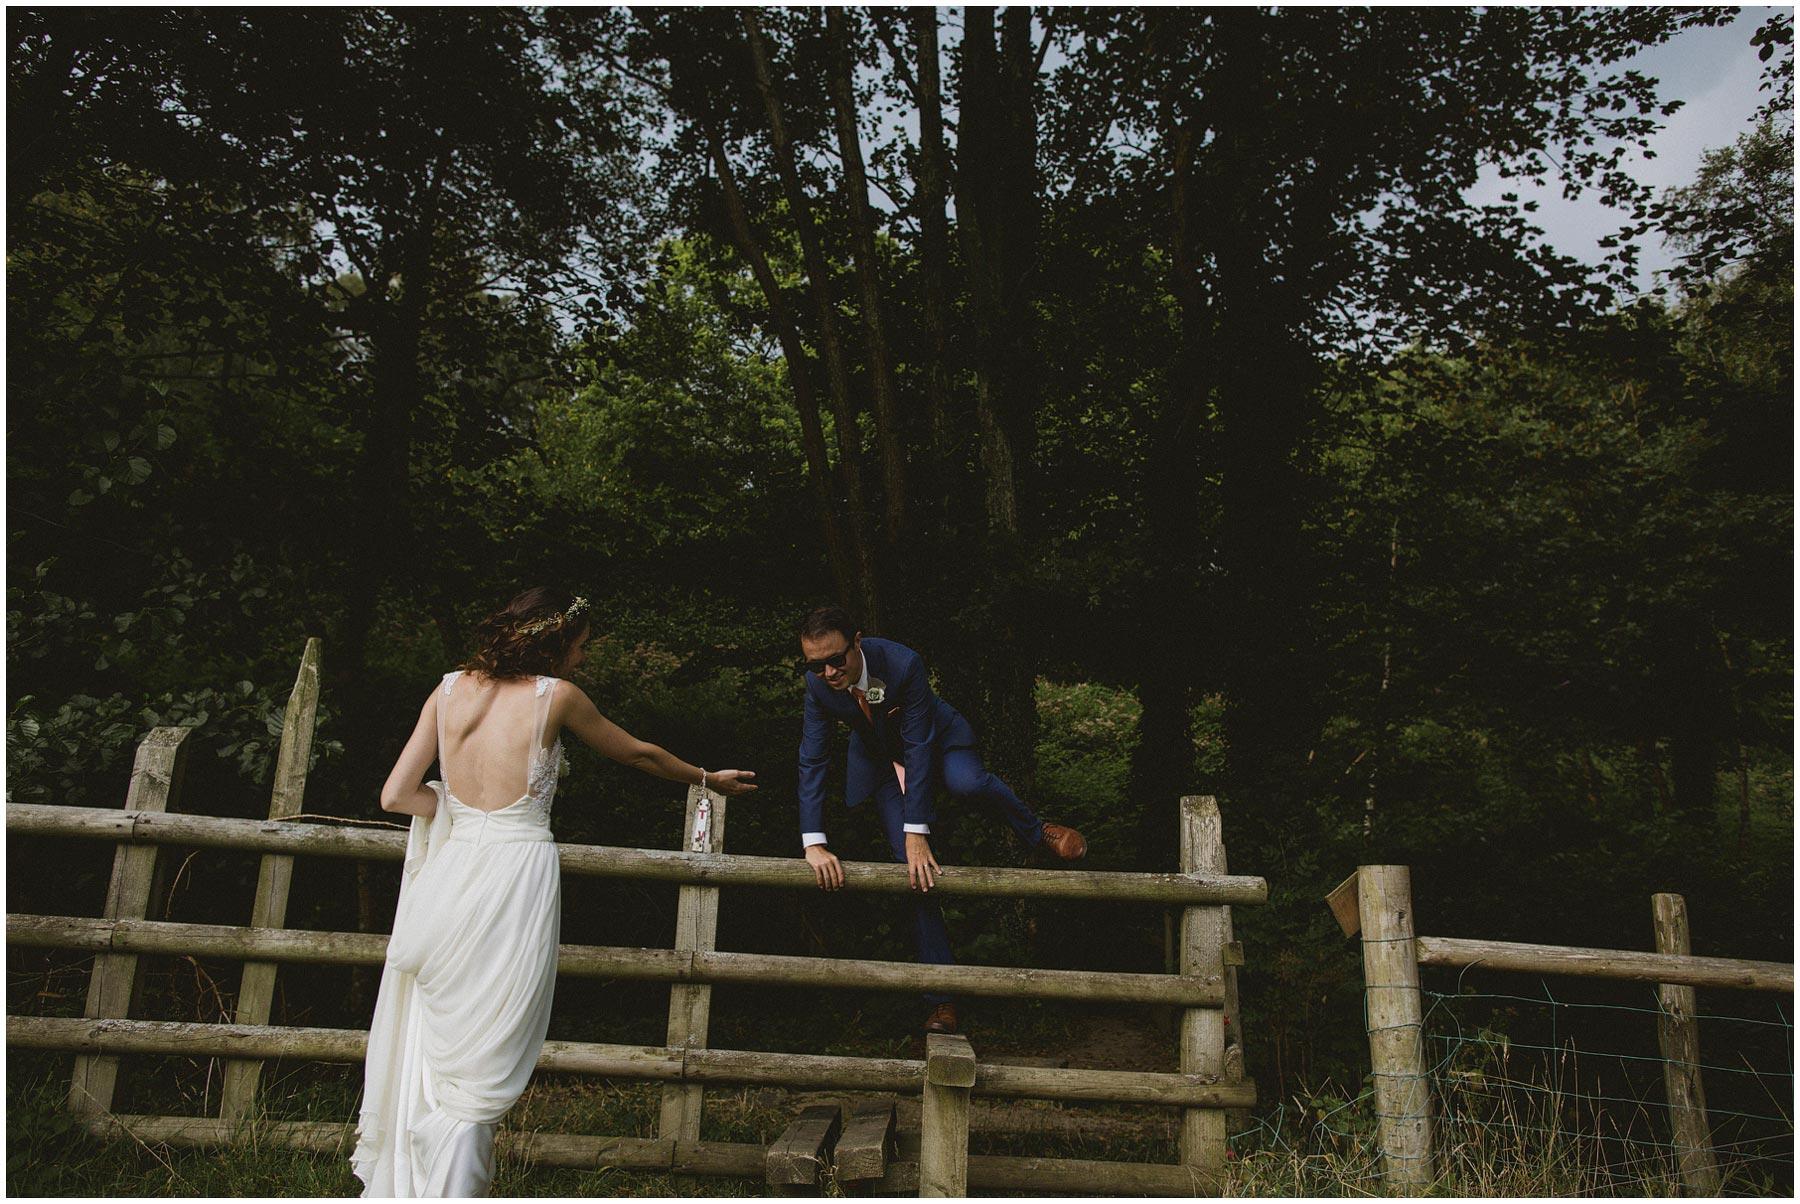 Colehayes-Park-Wedding-Photography_0146